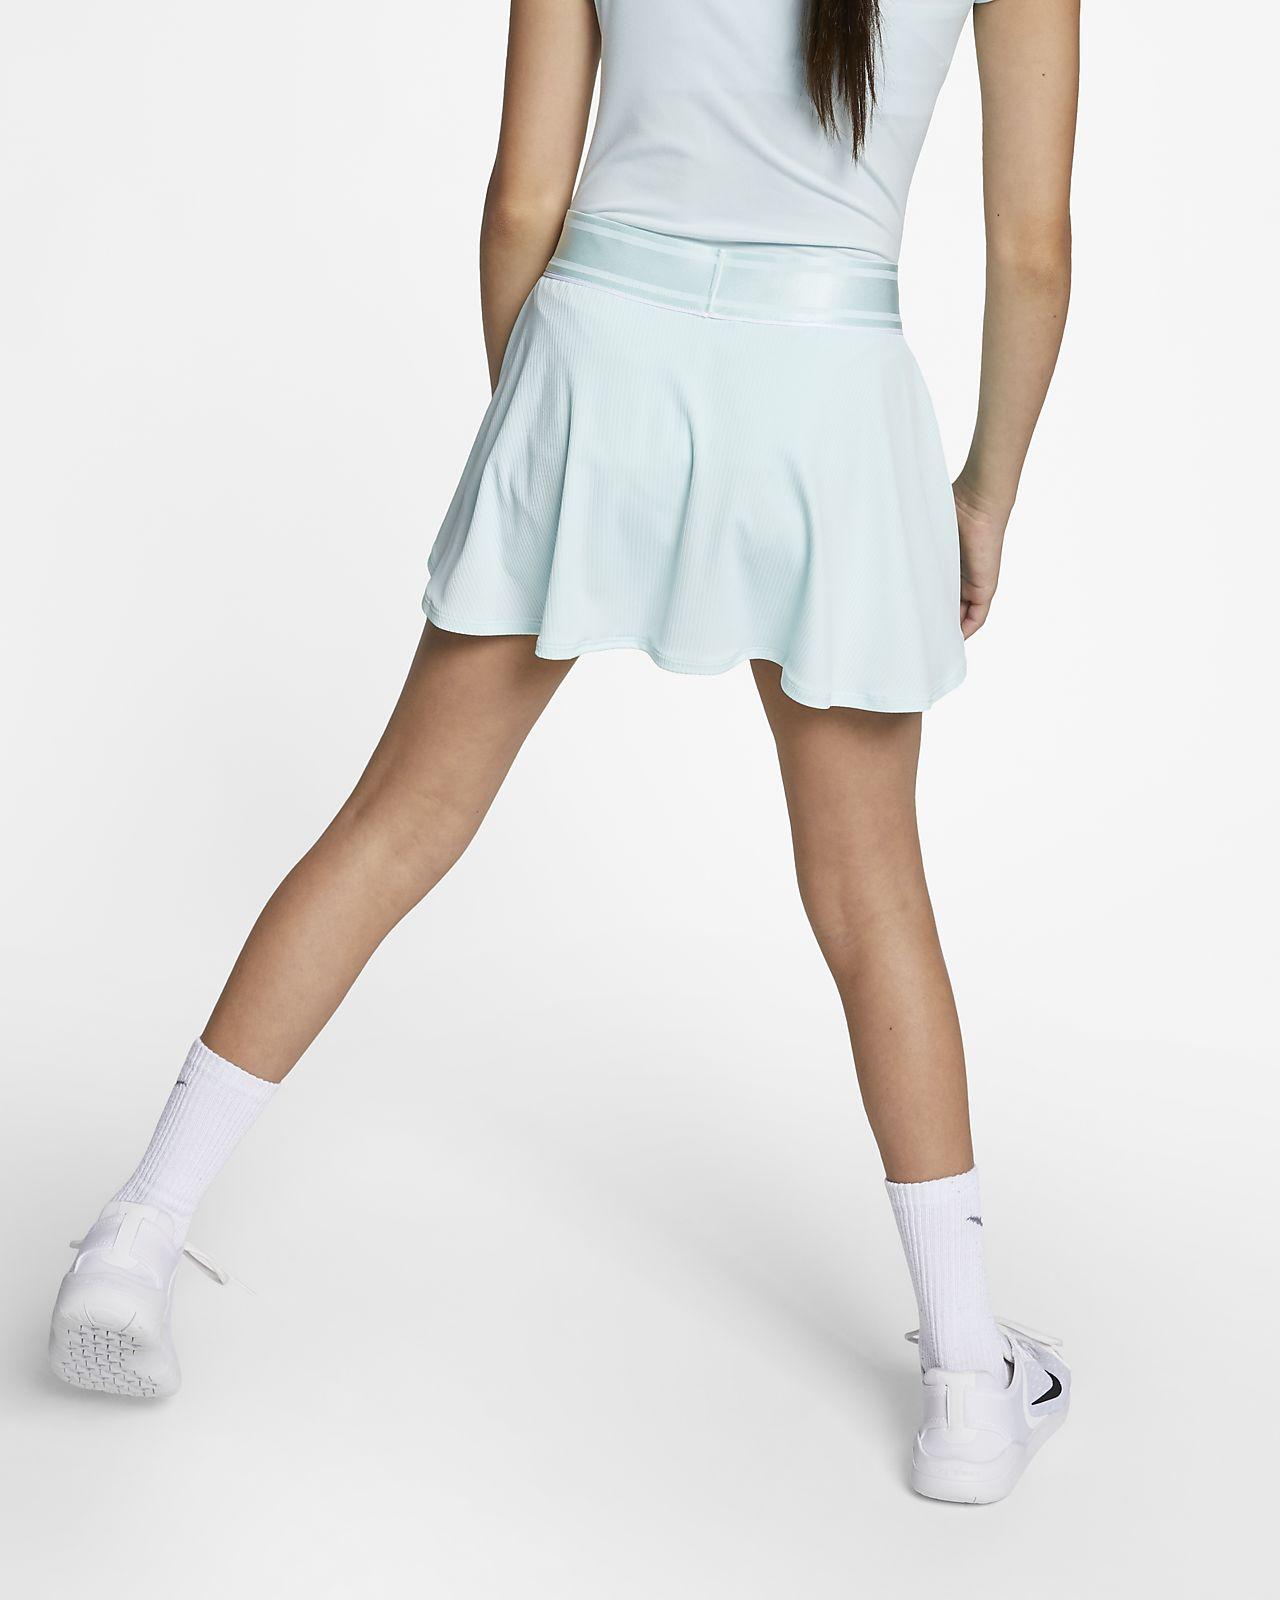 ab58f89c84 Buy Nike Tennis Skirt – DACC